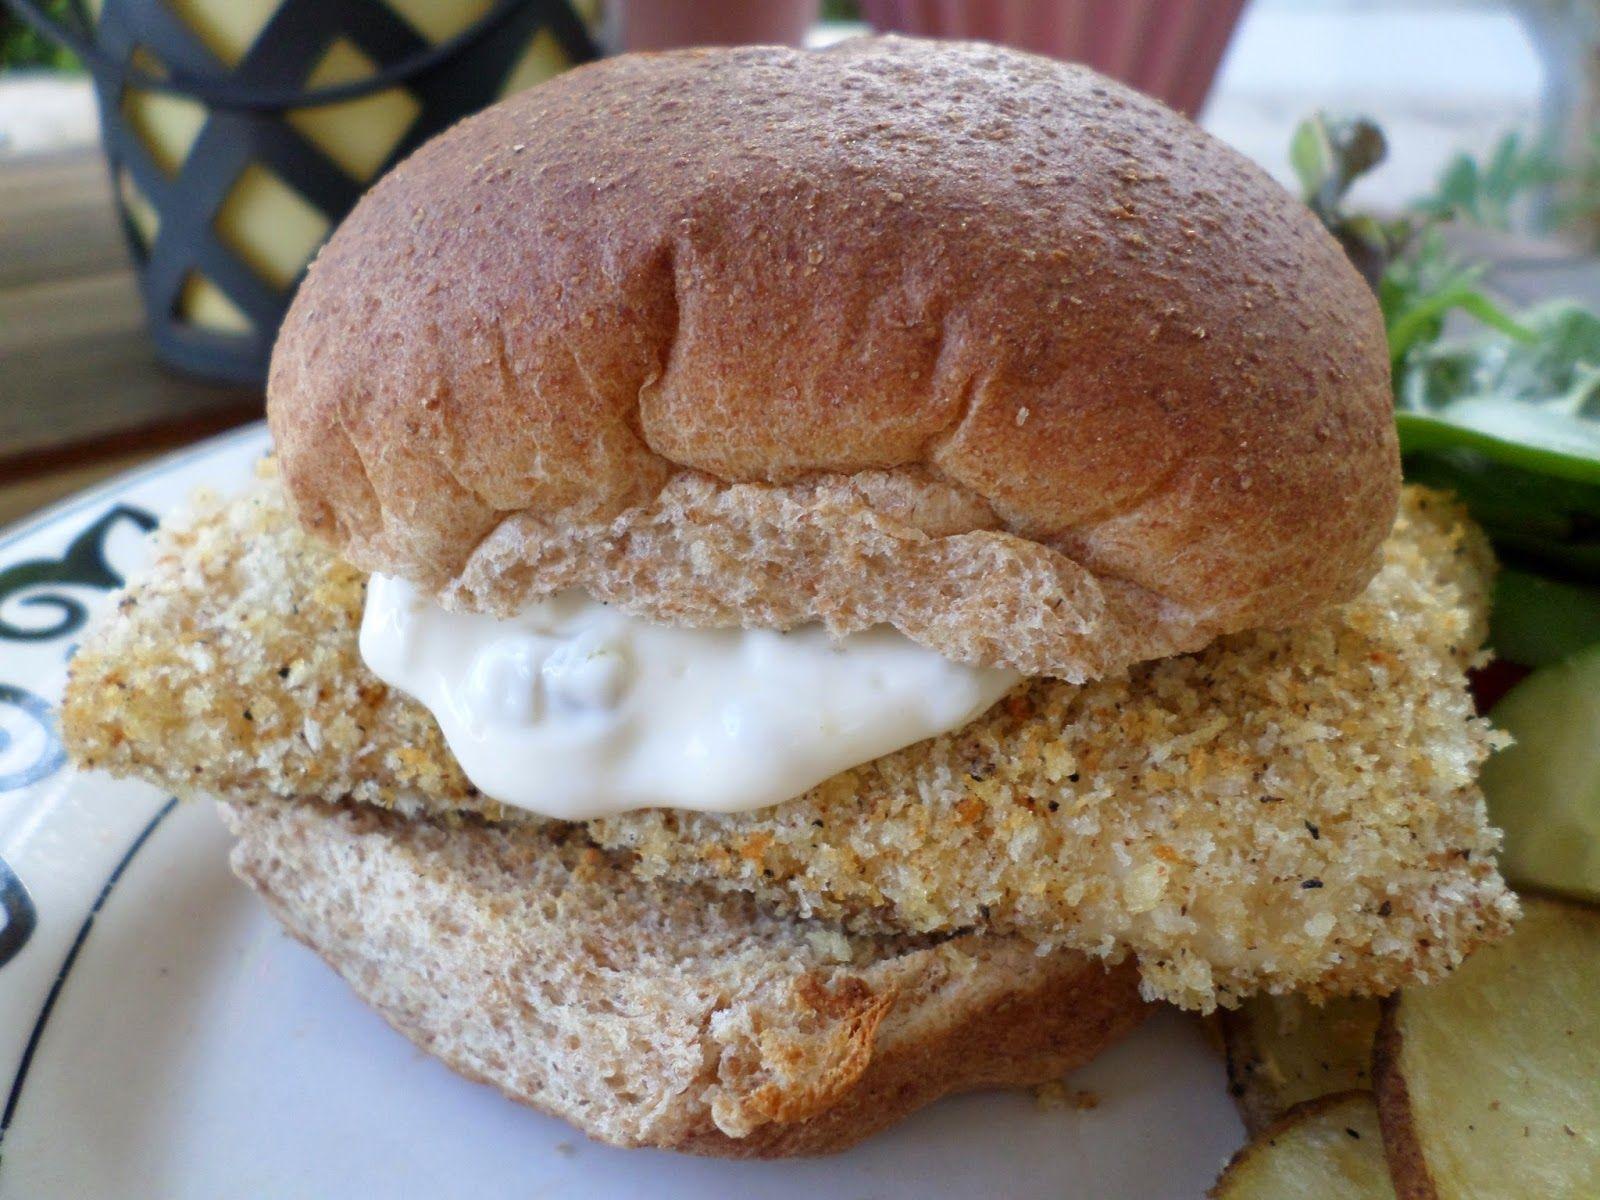 Spicy Crispy Fish Sandwich (with Jalapeno Mayo)